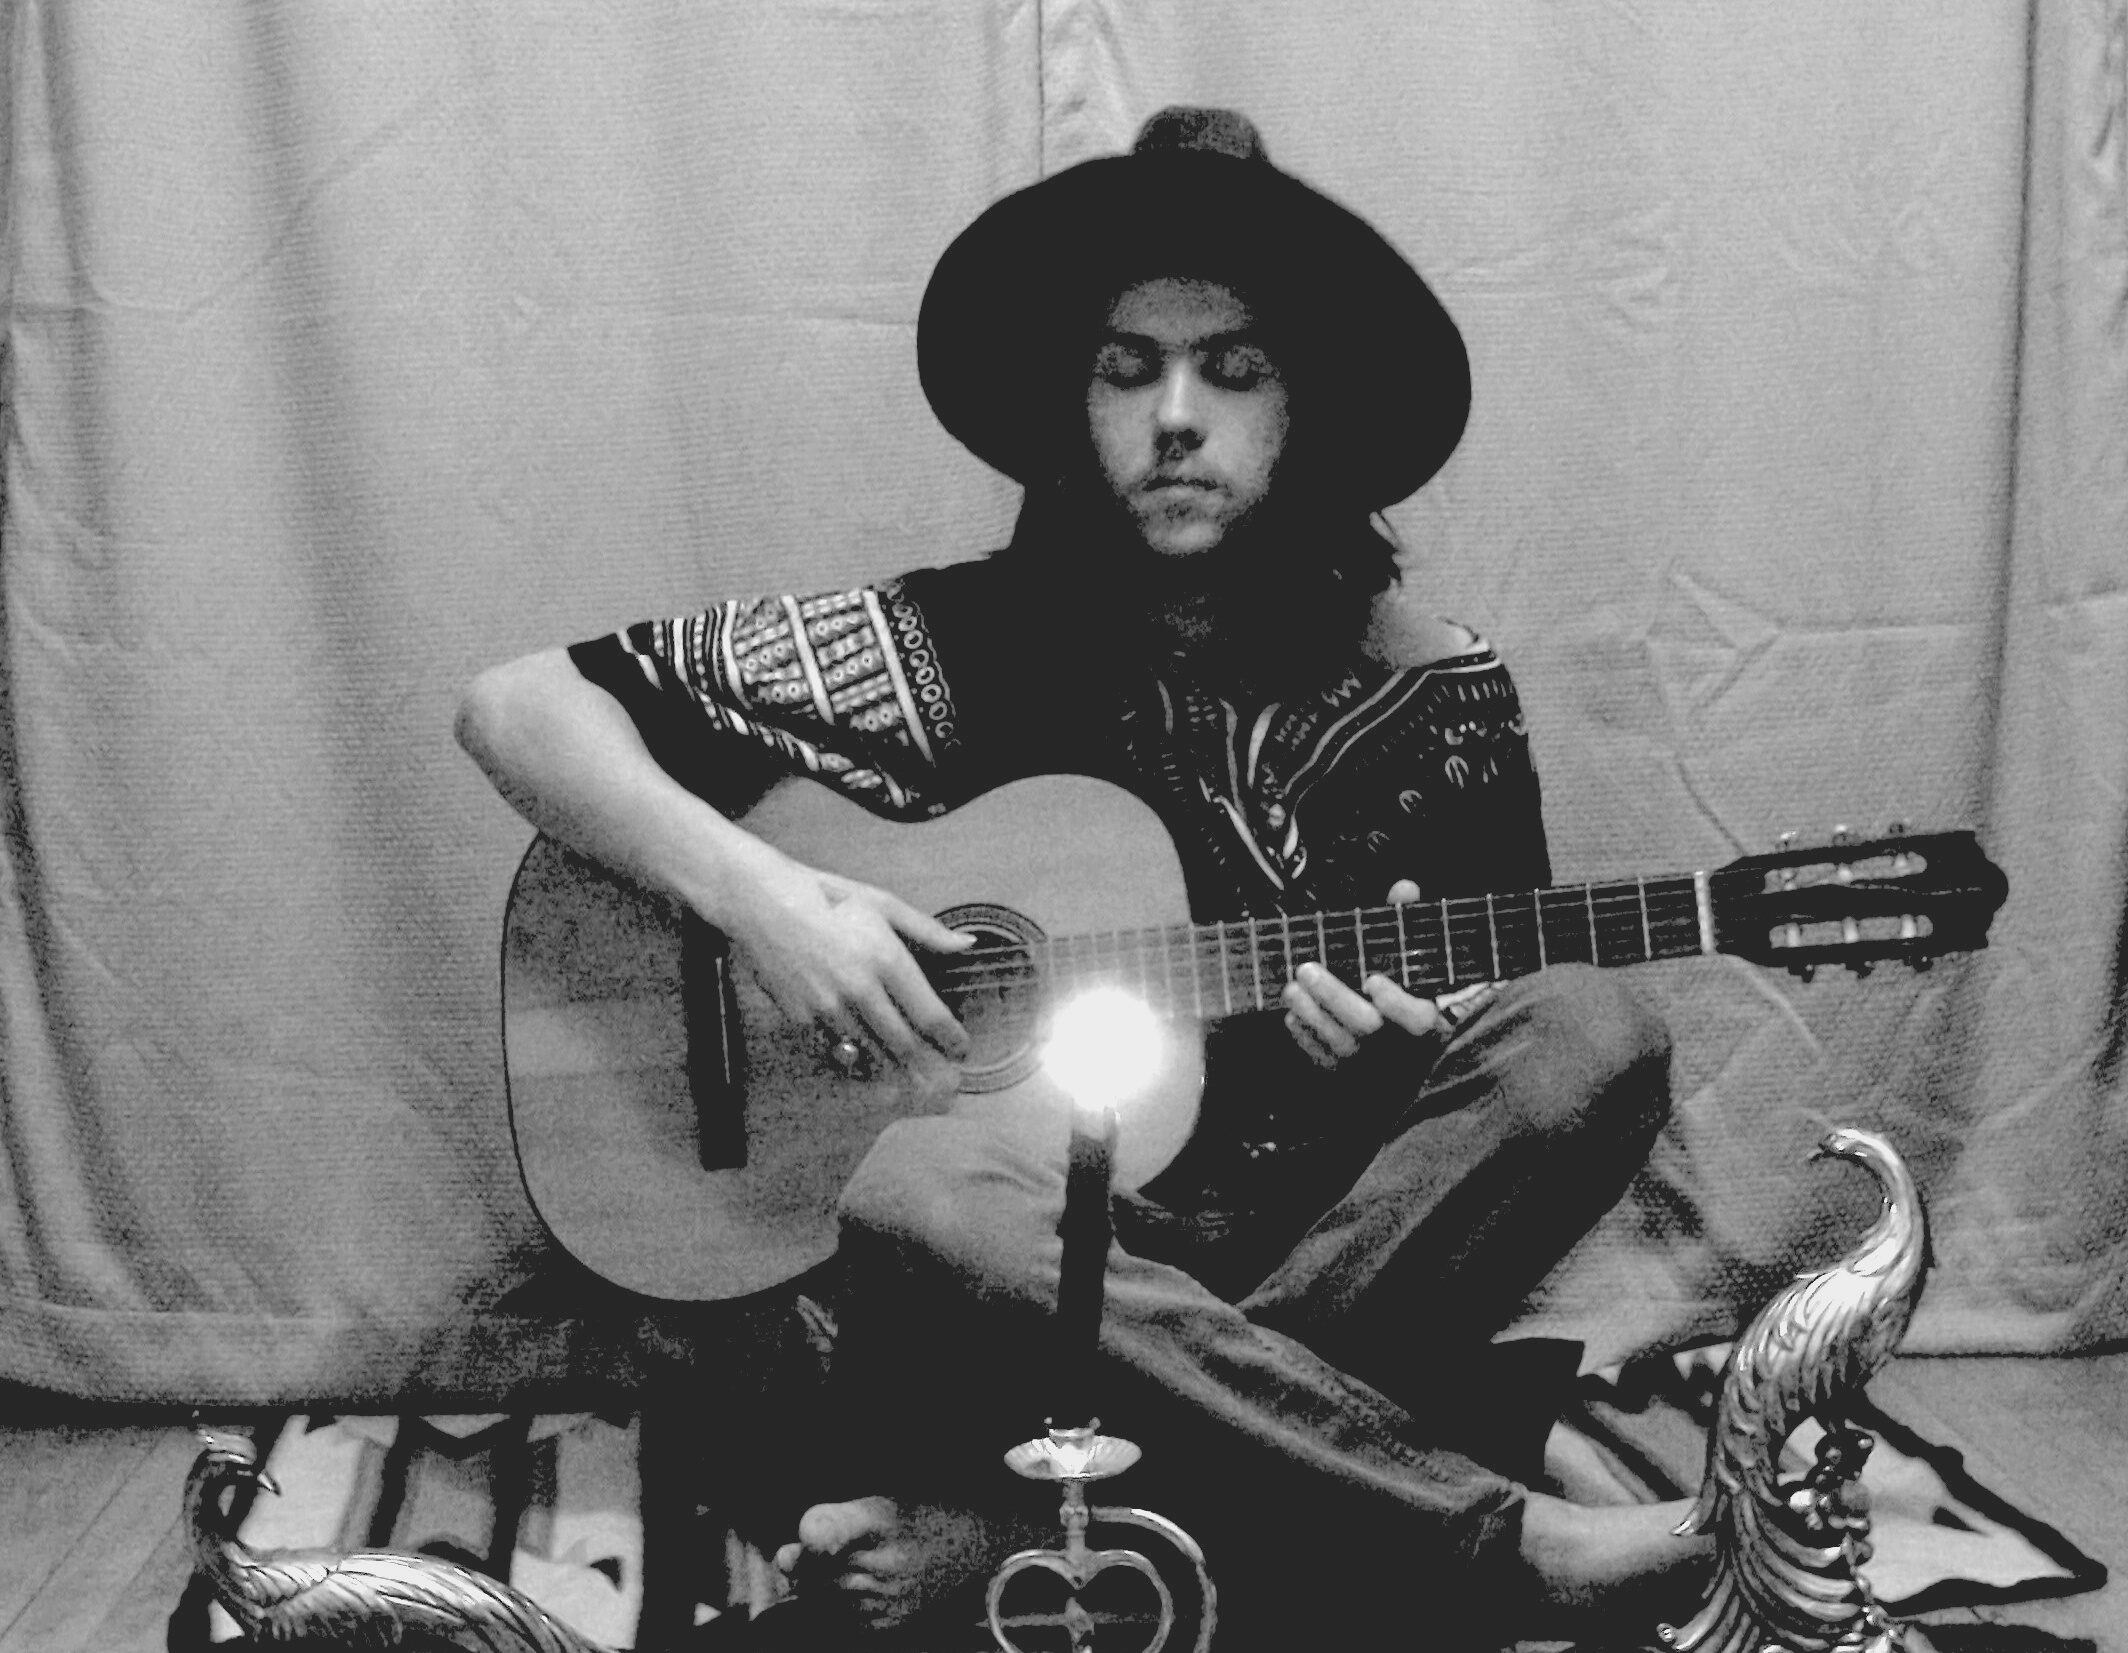 Alex Gumm, Albert, Missing Person, Kauai, Maine, Guitar, Spiritual